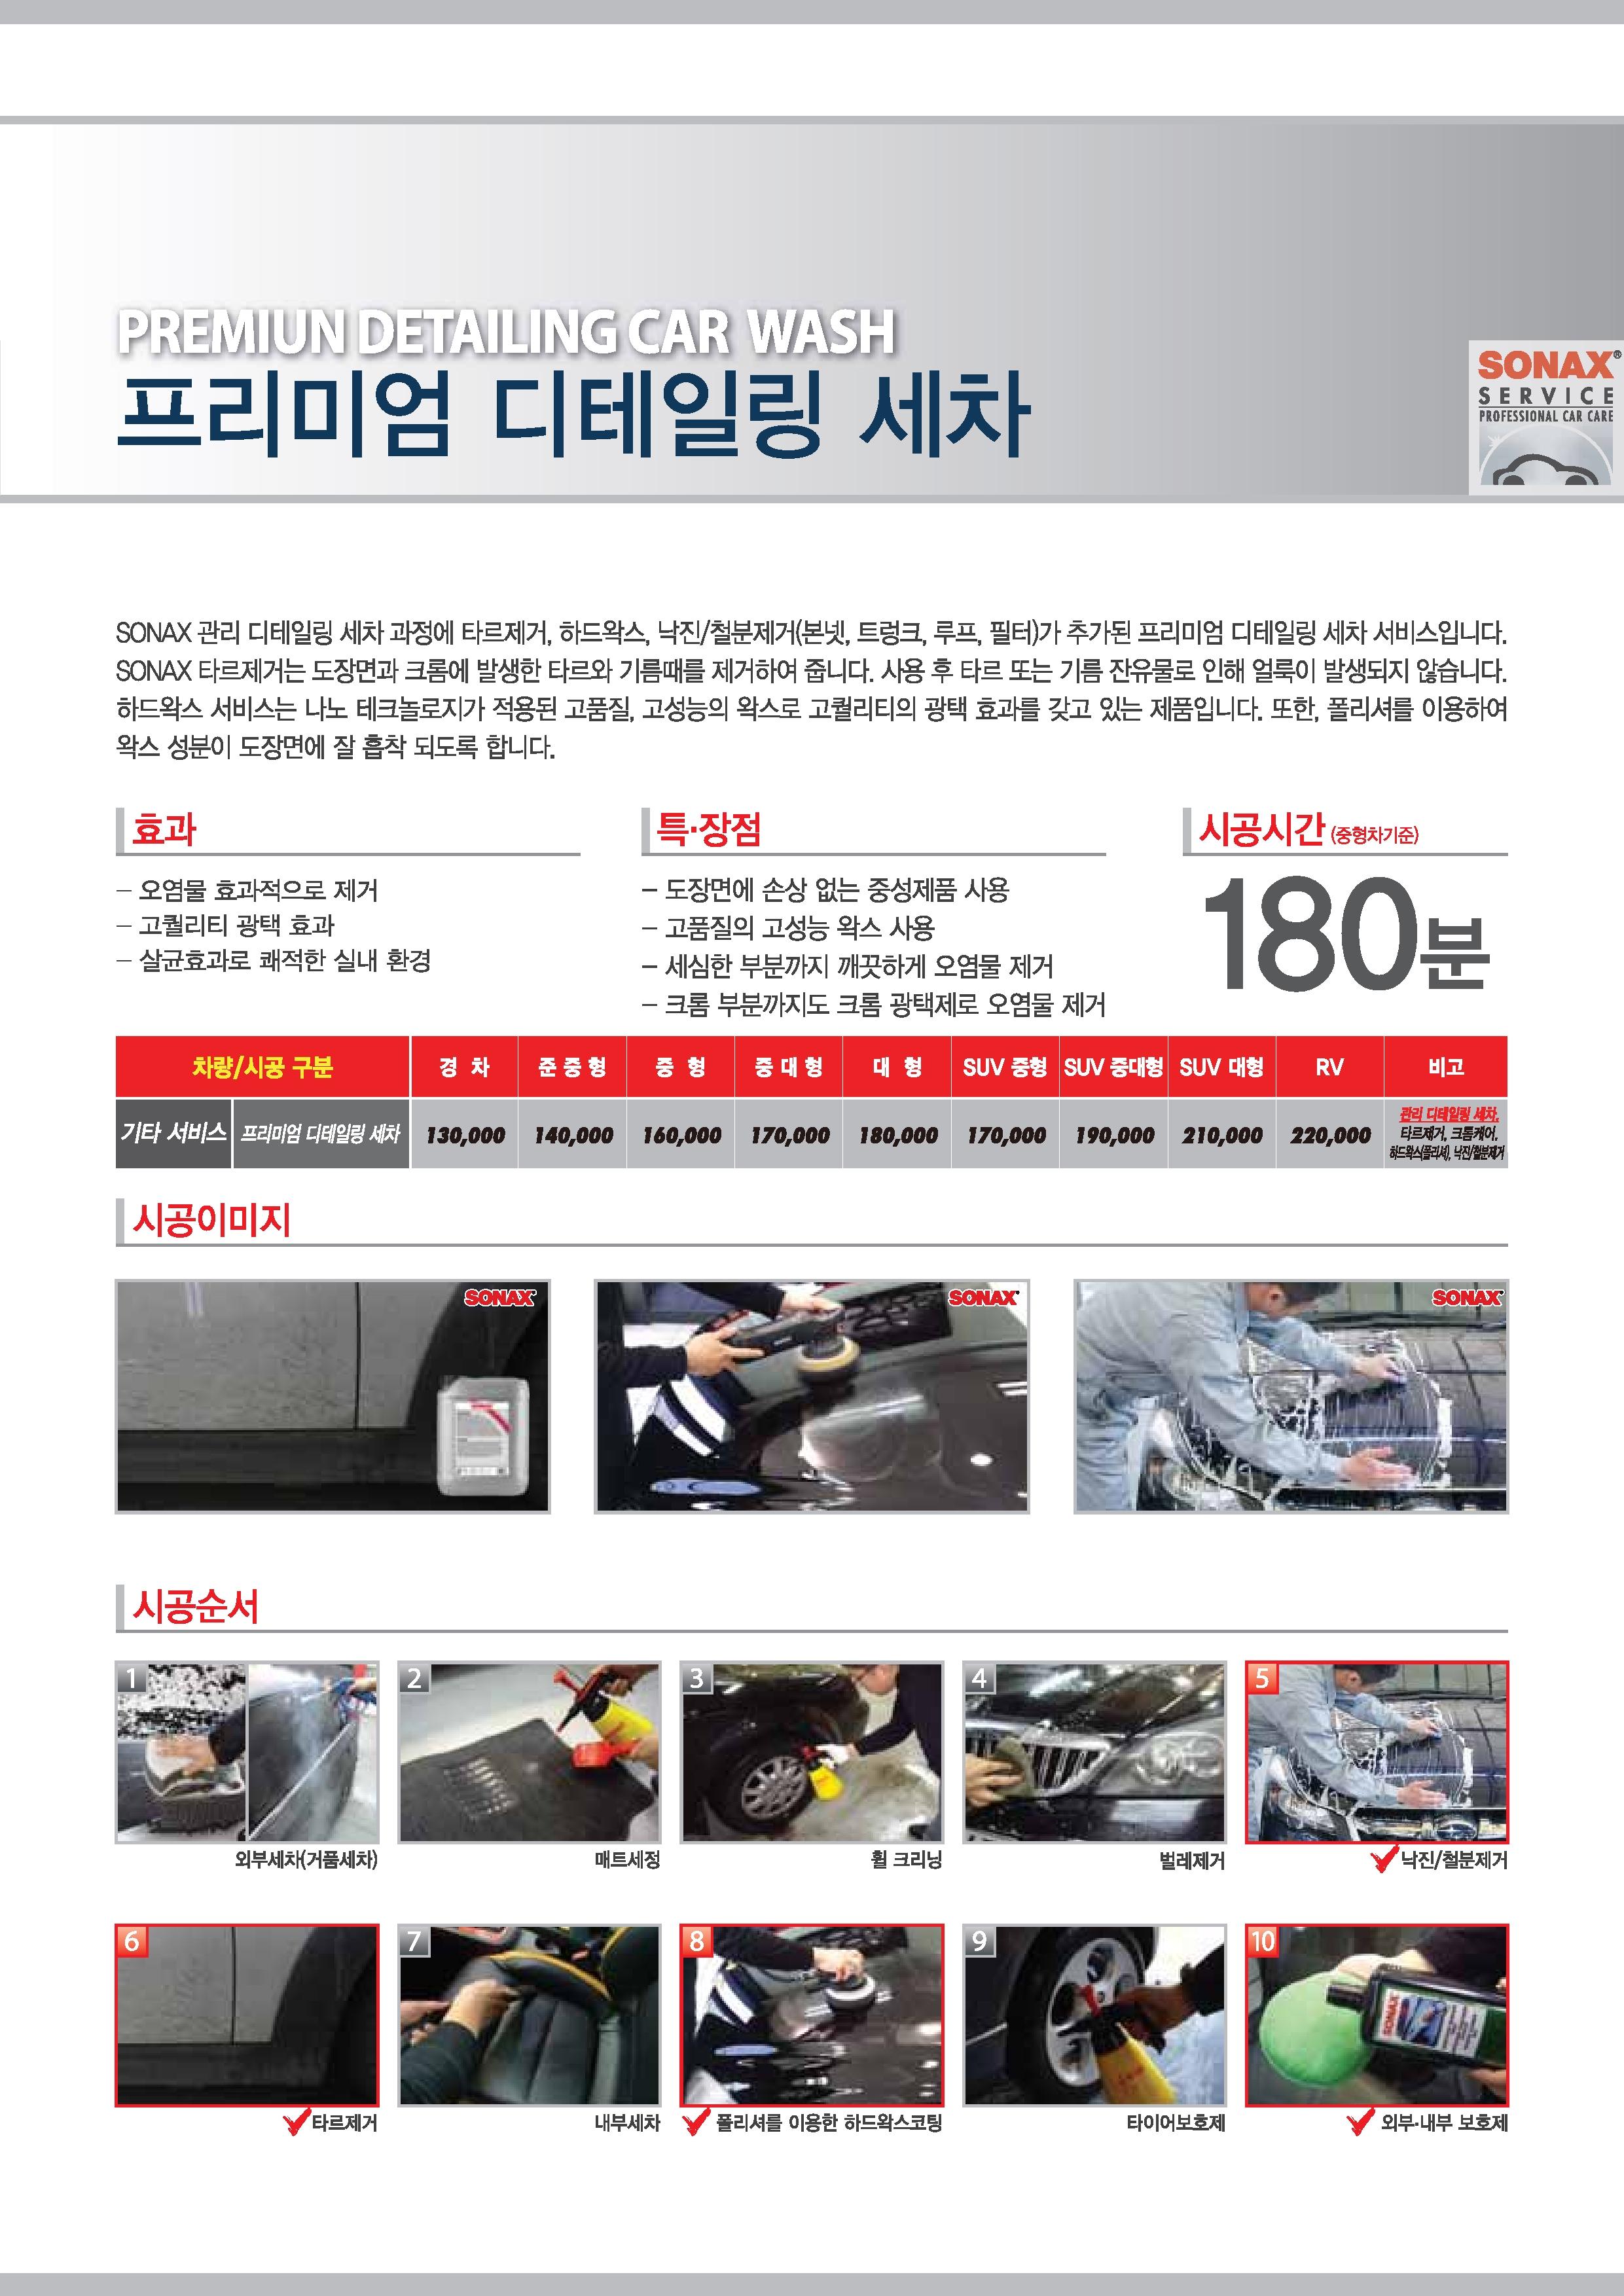 SONAX_서비스매뉴얼_20150529_s_15.jpg